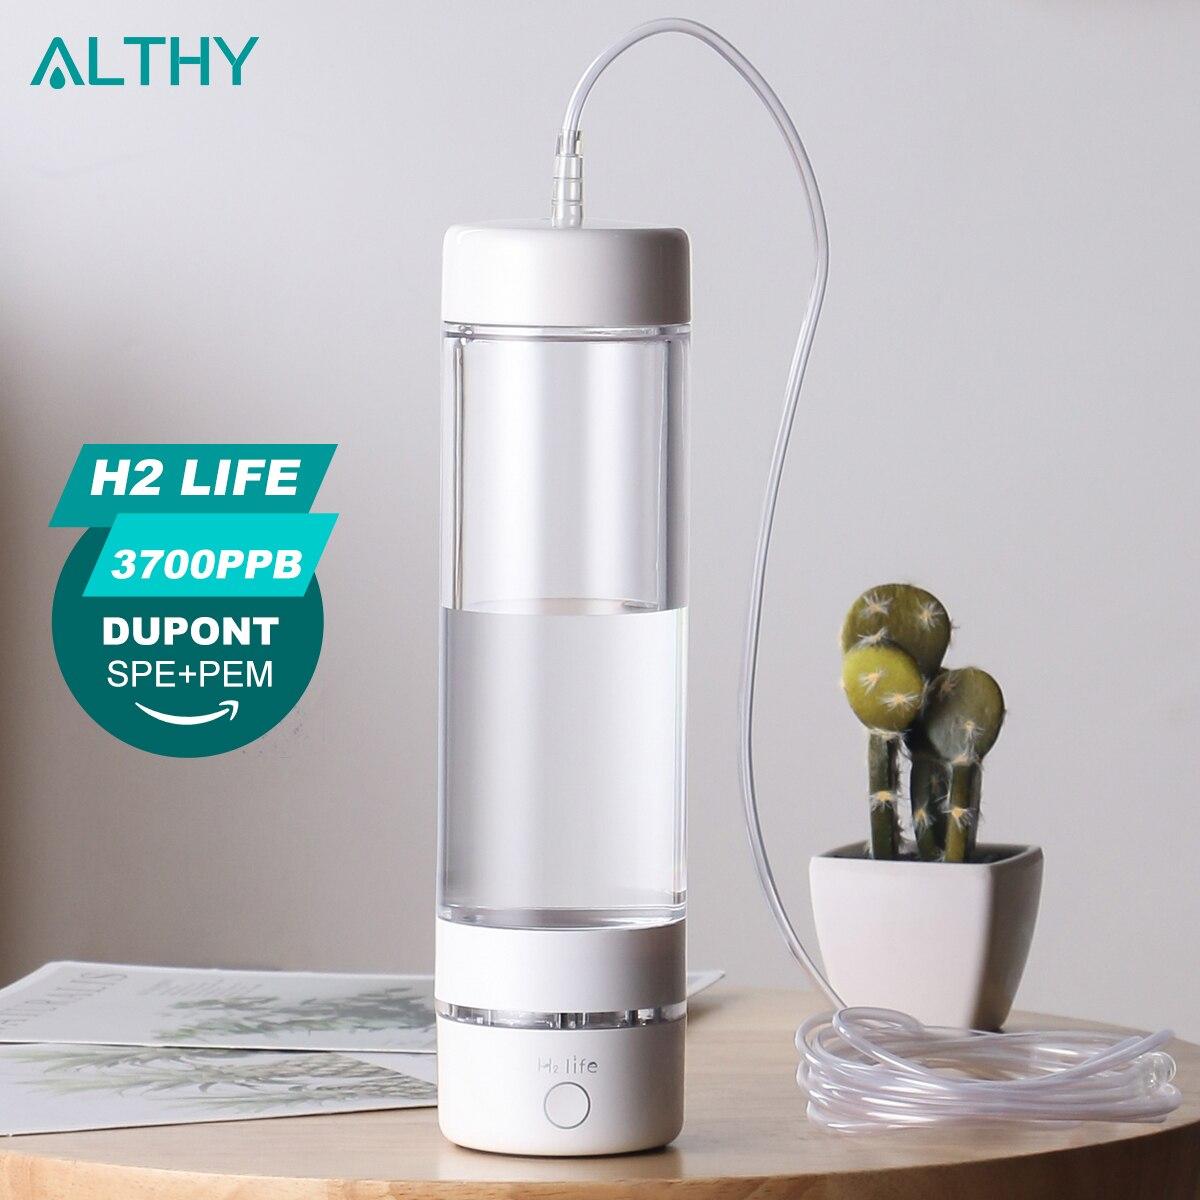 H2Life الجيل 5th مولد ماء الهيدروجين زجاجة ماكس 3700ppb دوبونت SPE + PEM غرفة مزدوجة مع طقم امتصاص الهيدروجين